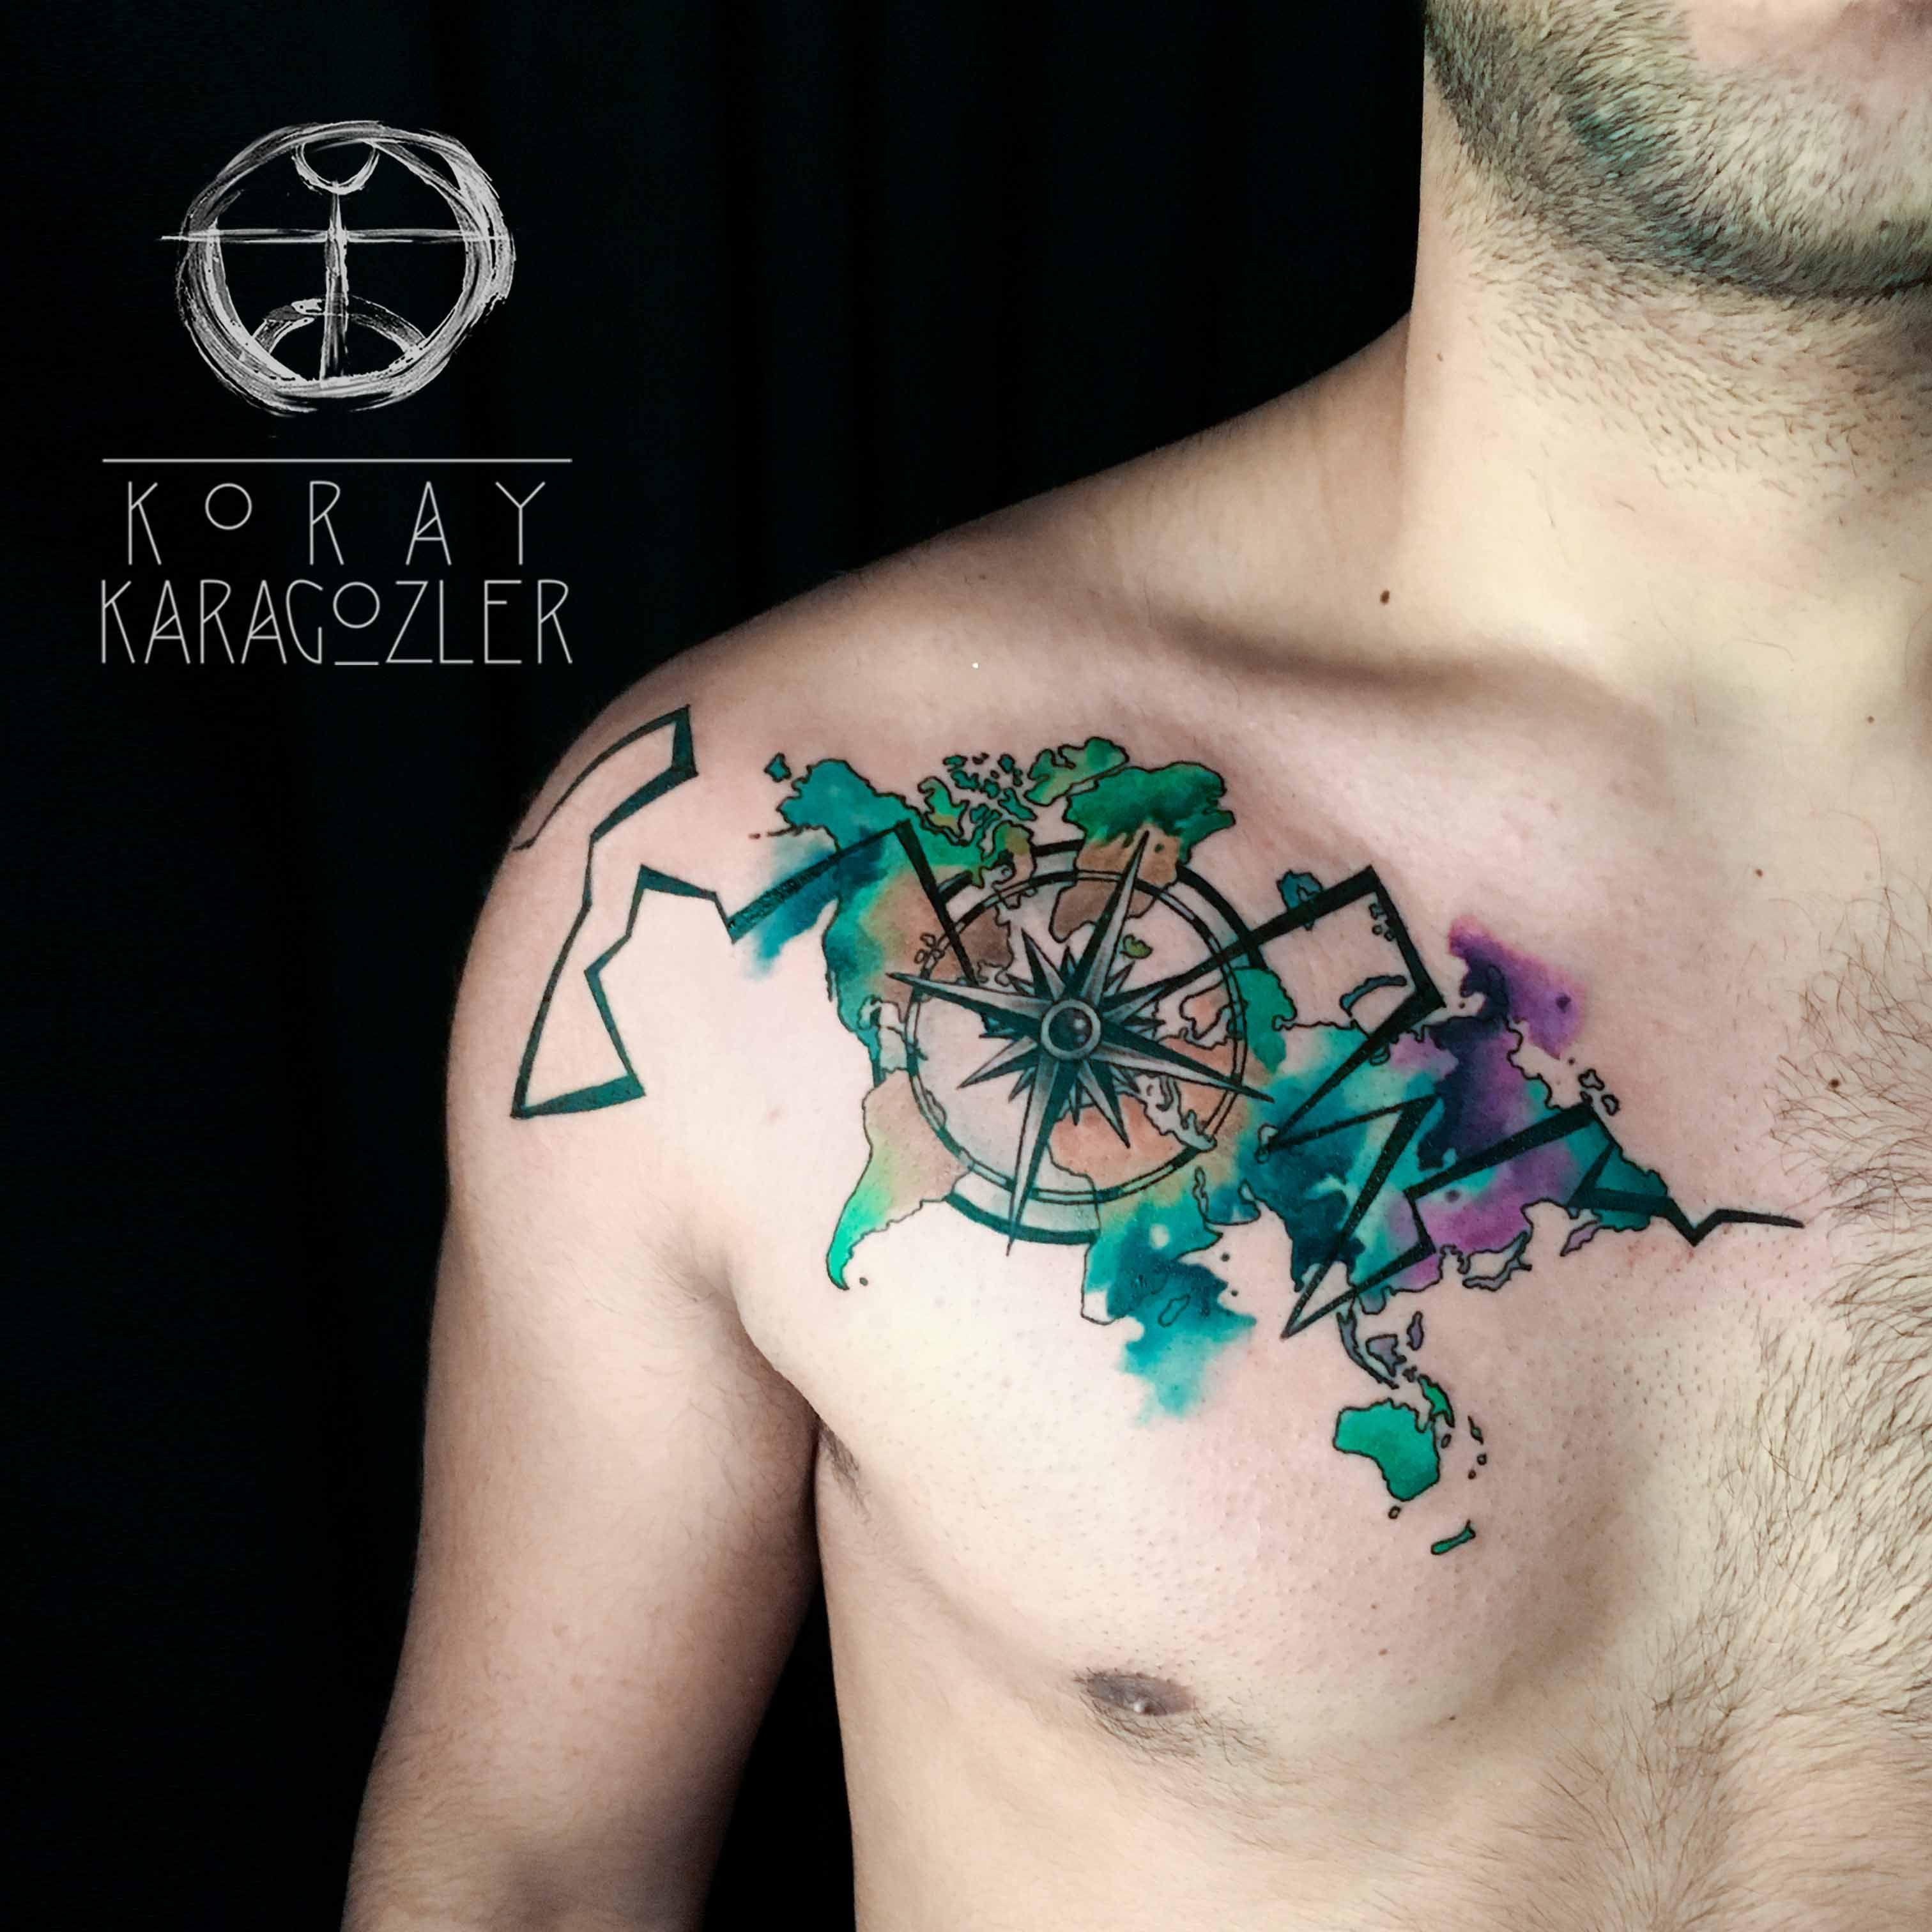 Abstract Compass Customtattoo Tattoo Tattooart Watercolor